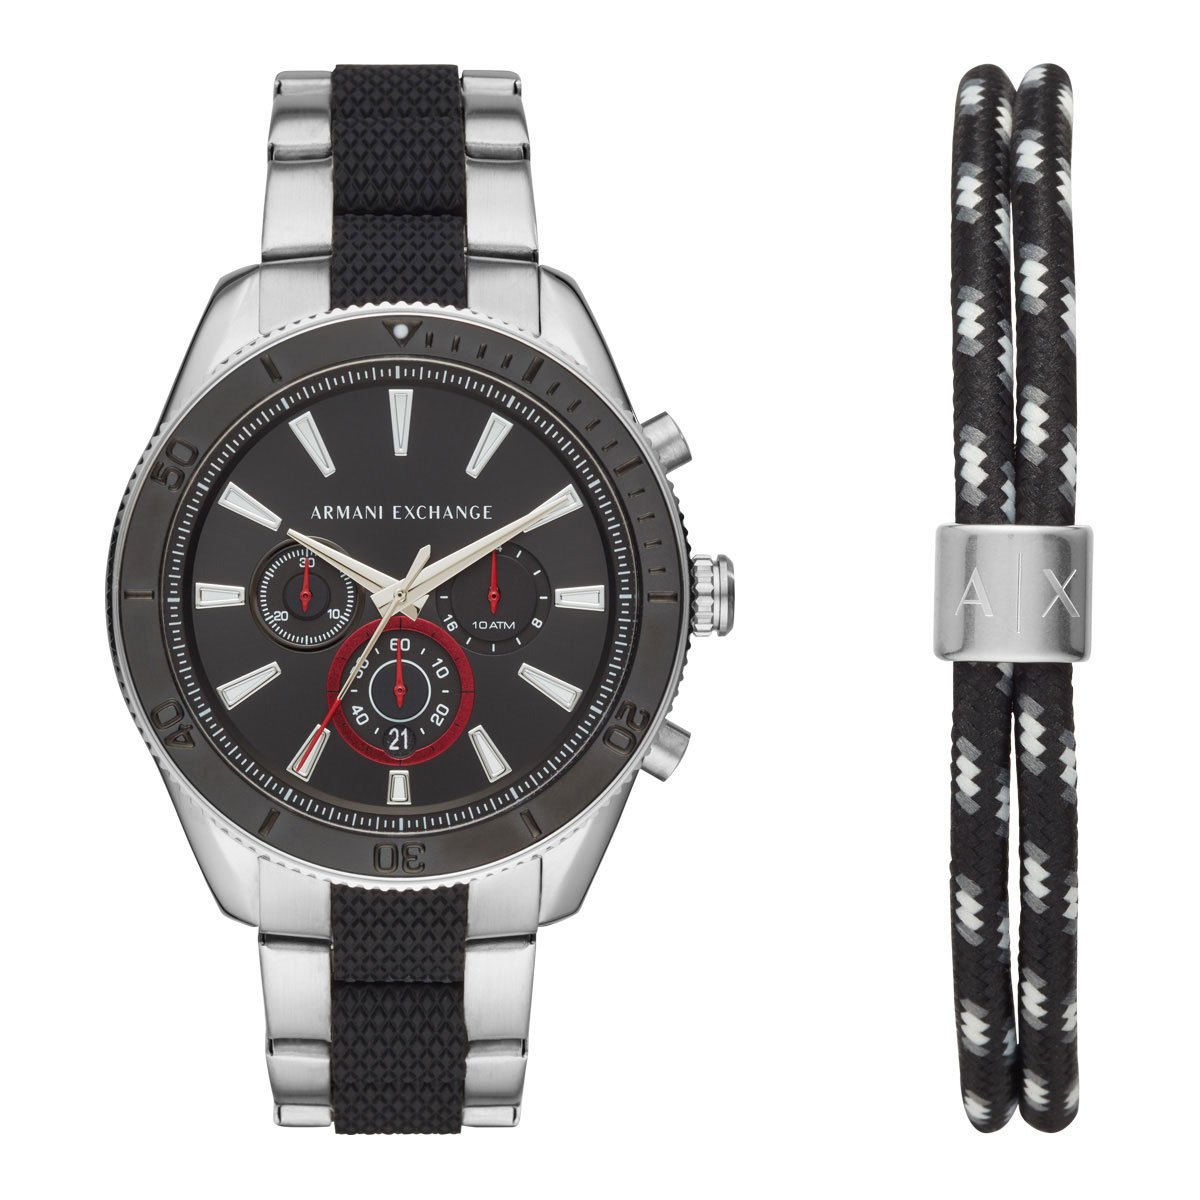 ae92cda41944 Reloj caballero Armani Exchange AX7106